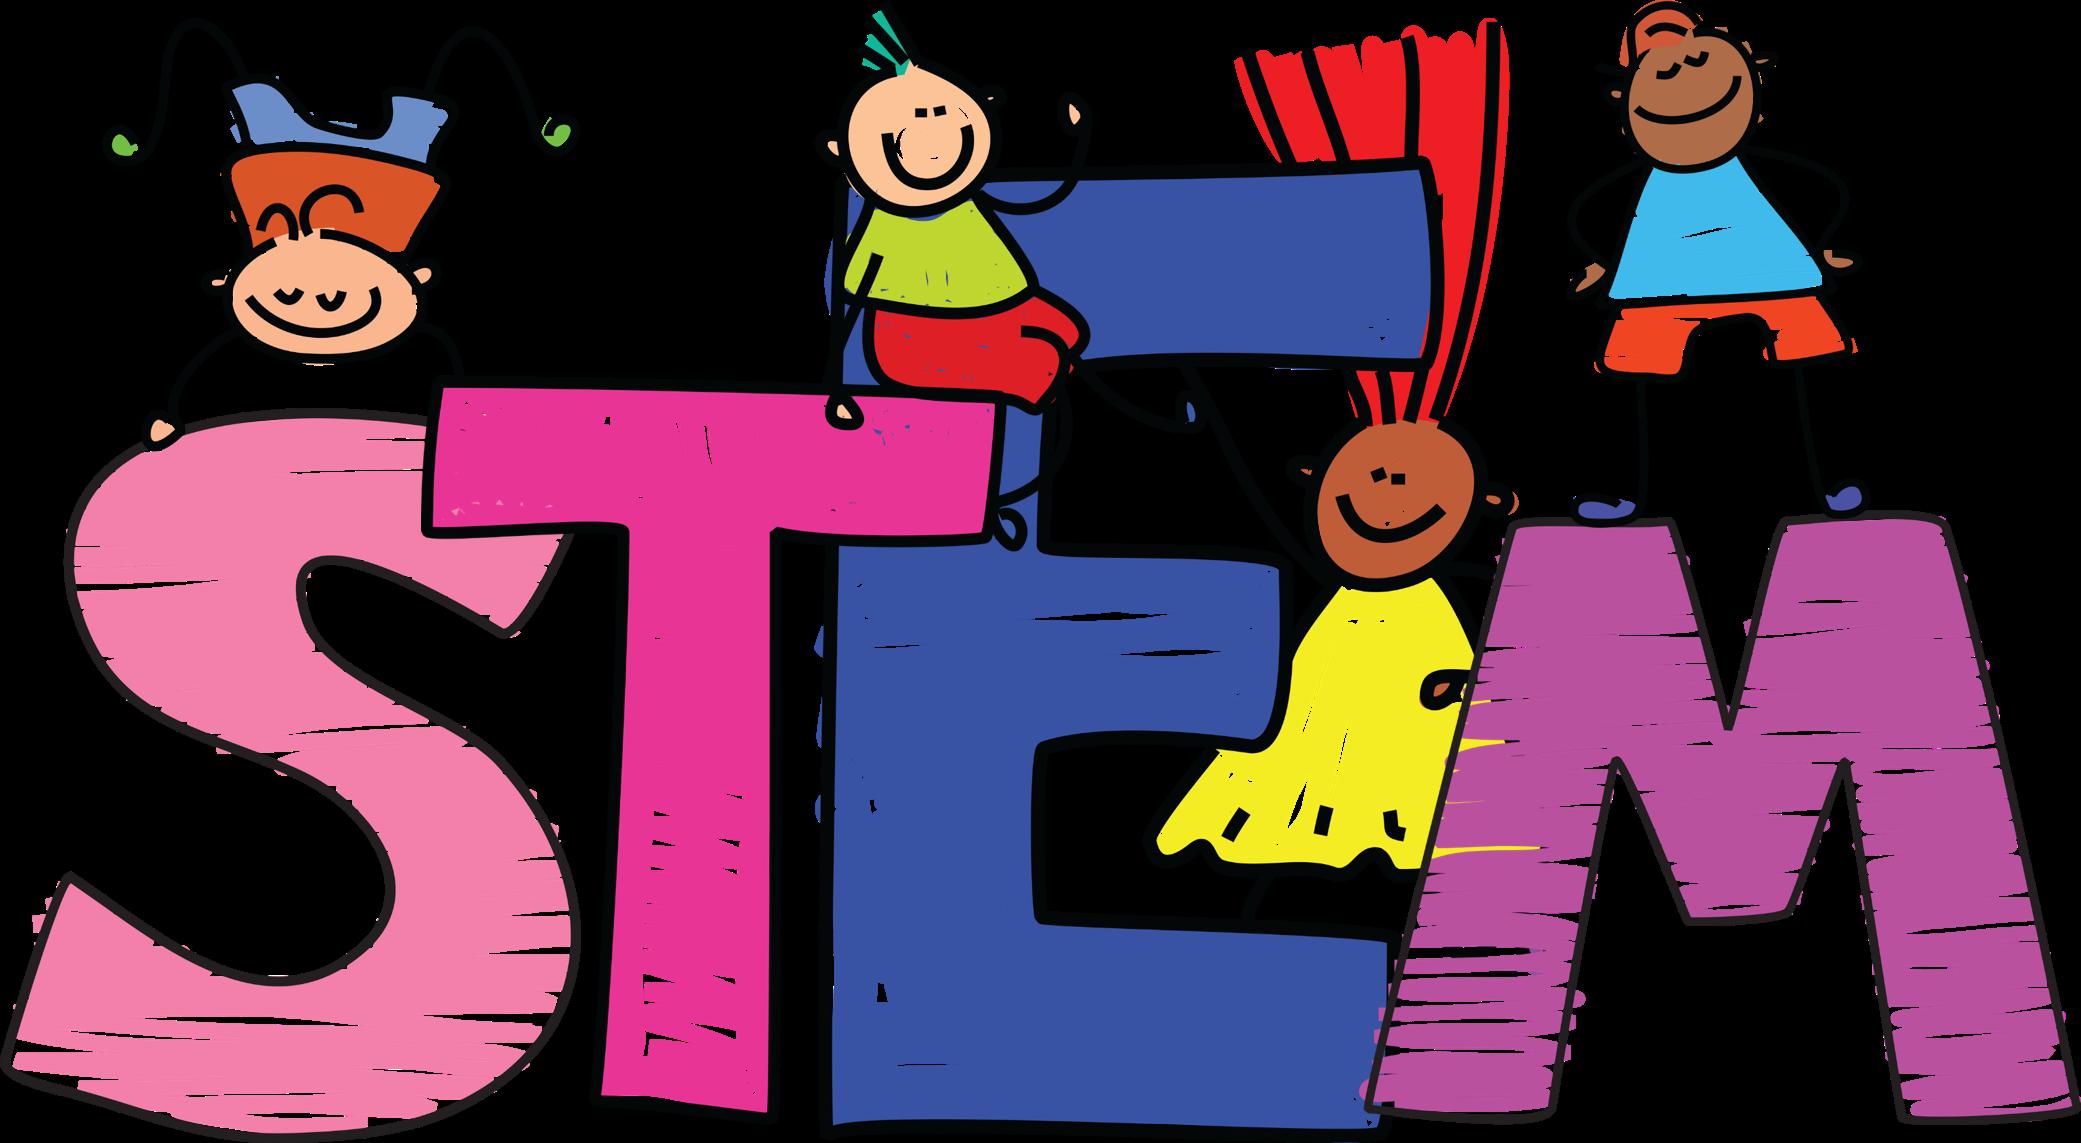 stem education and skills development